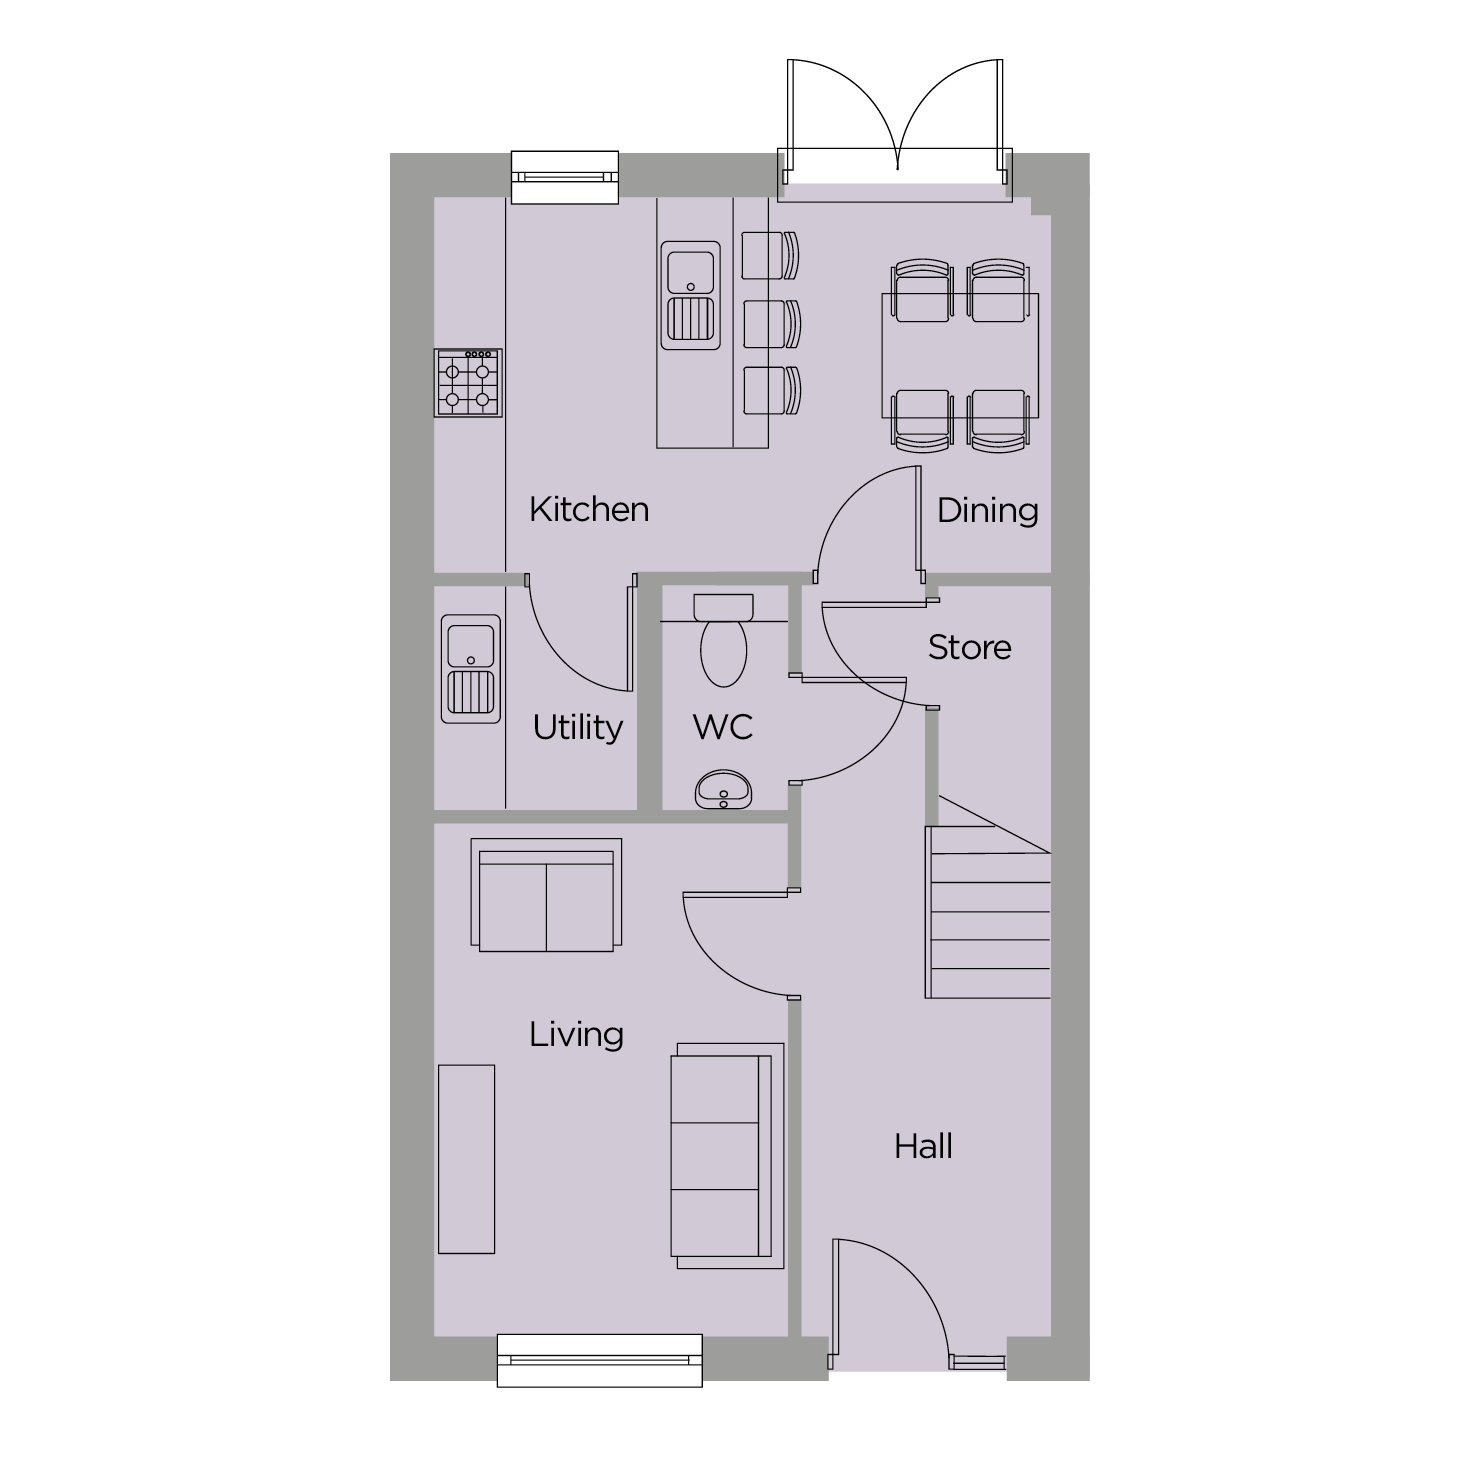 meadow_view_floorplans_the_elm_1.png